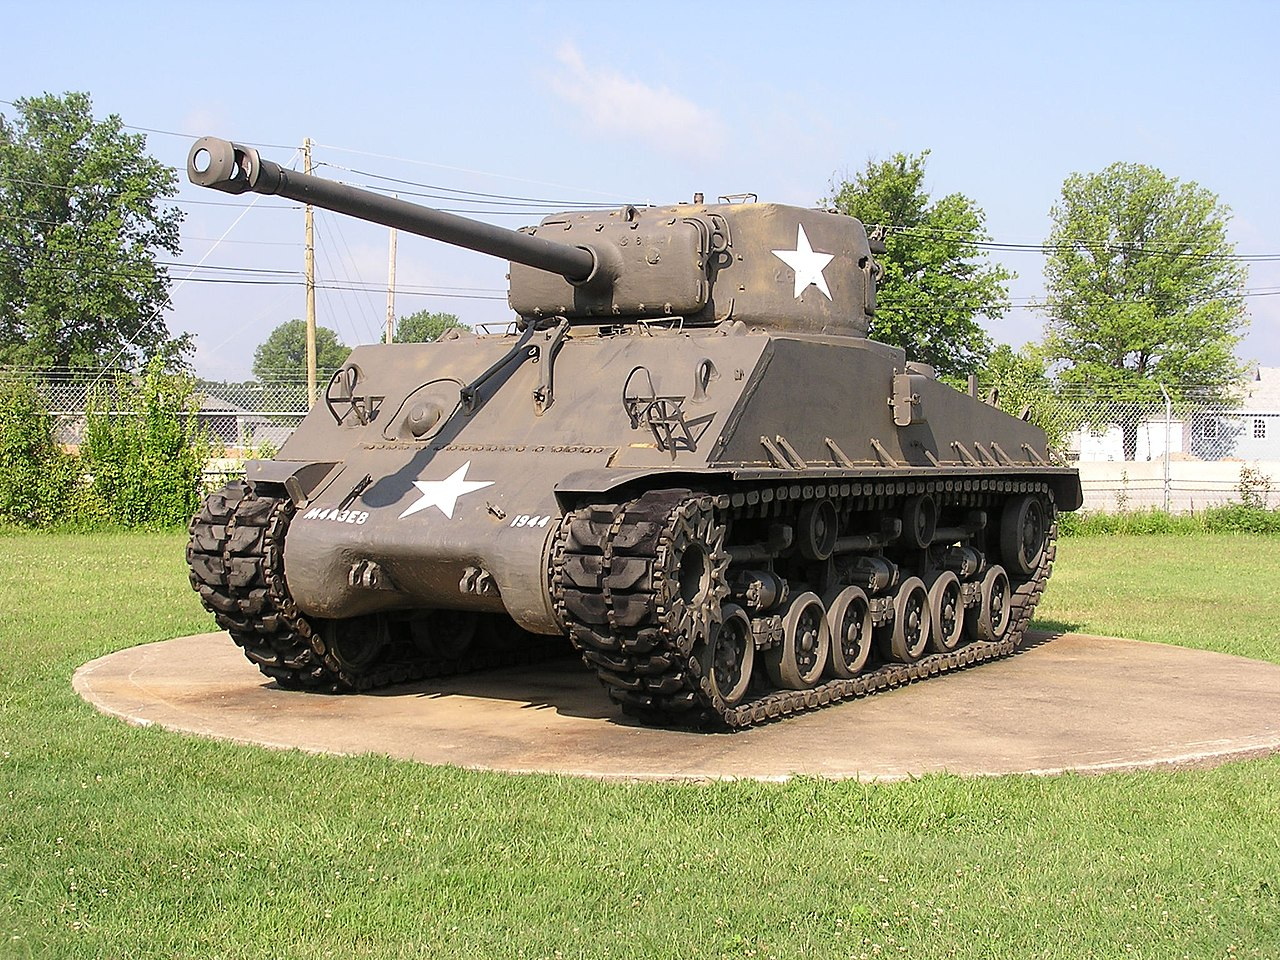 1280px-TankshermanM4.jpg